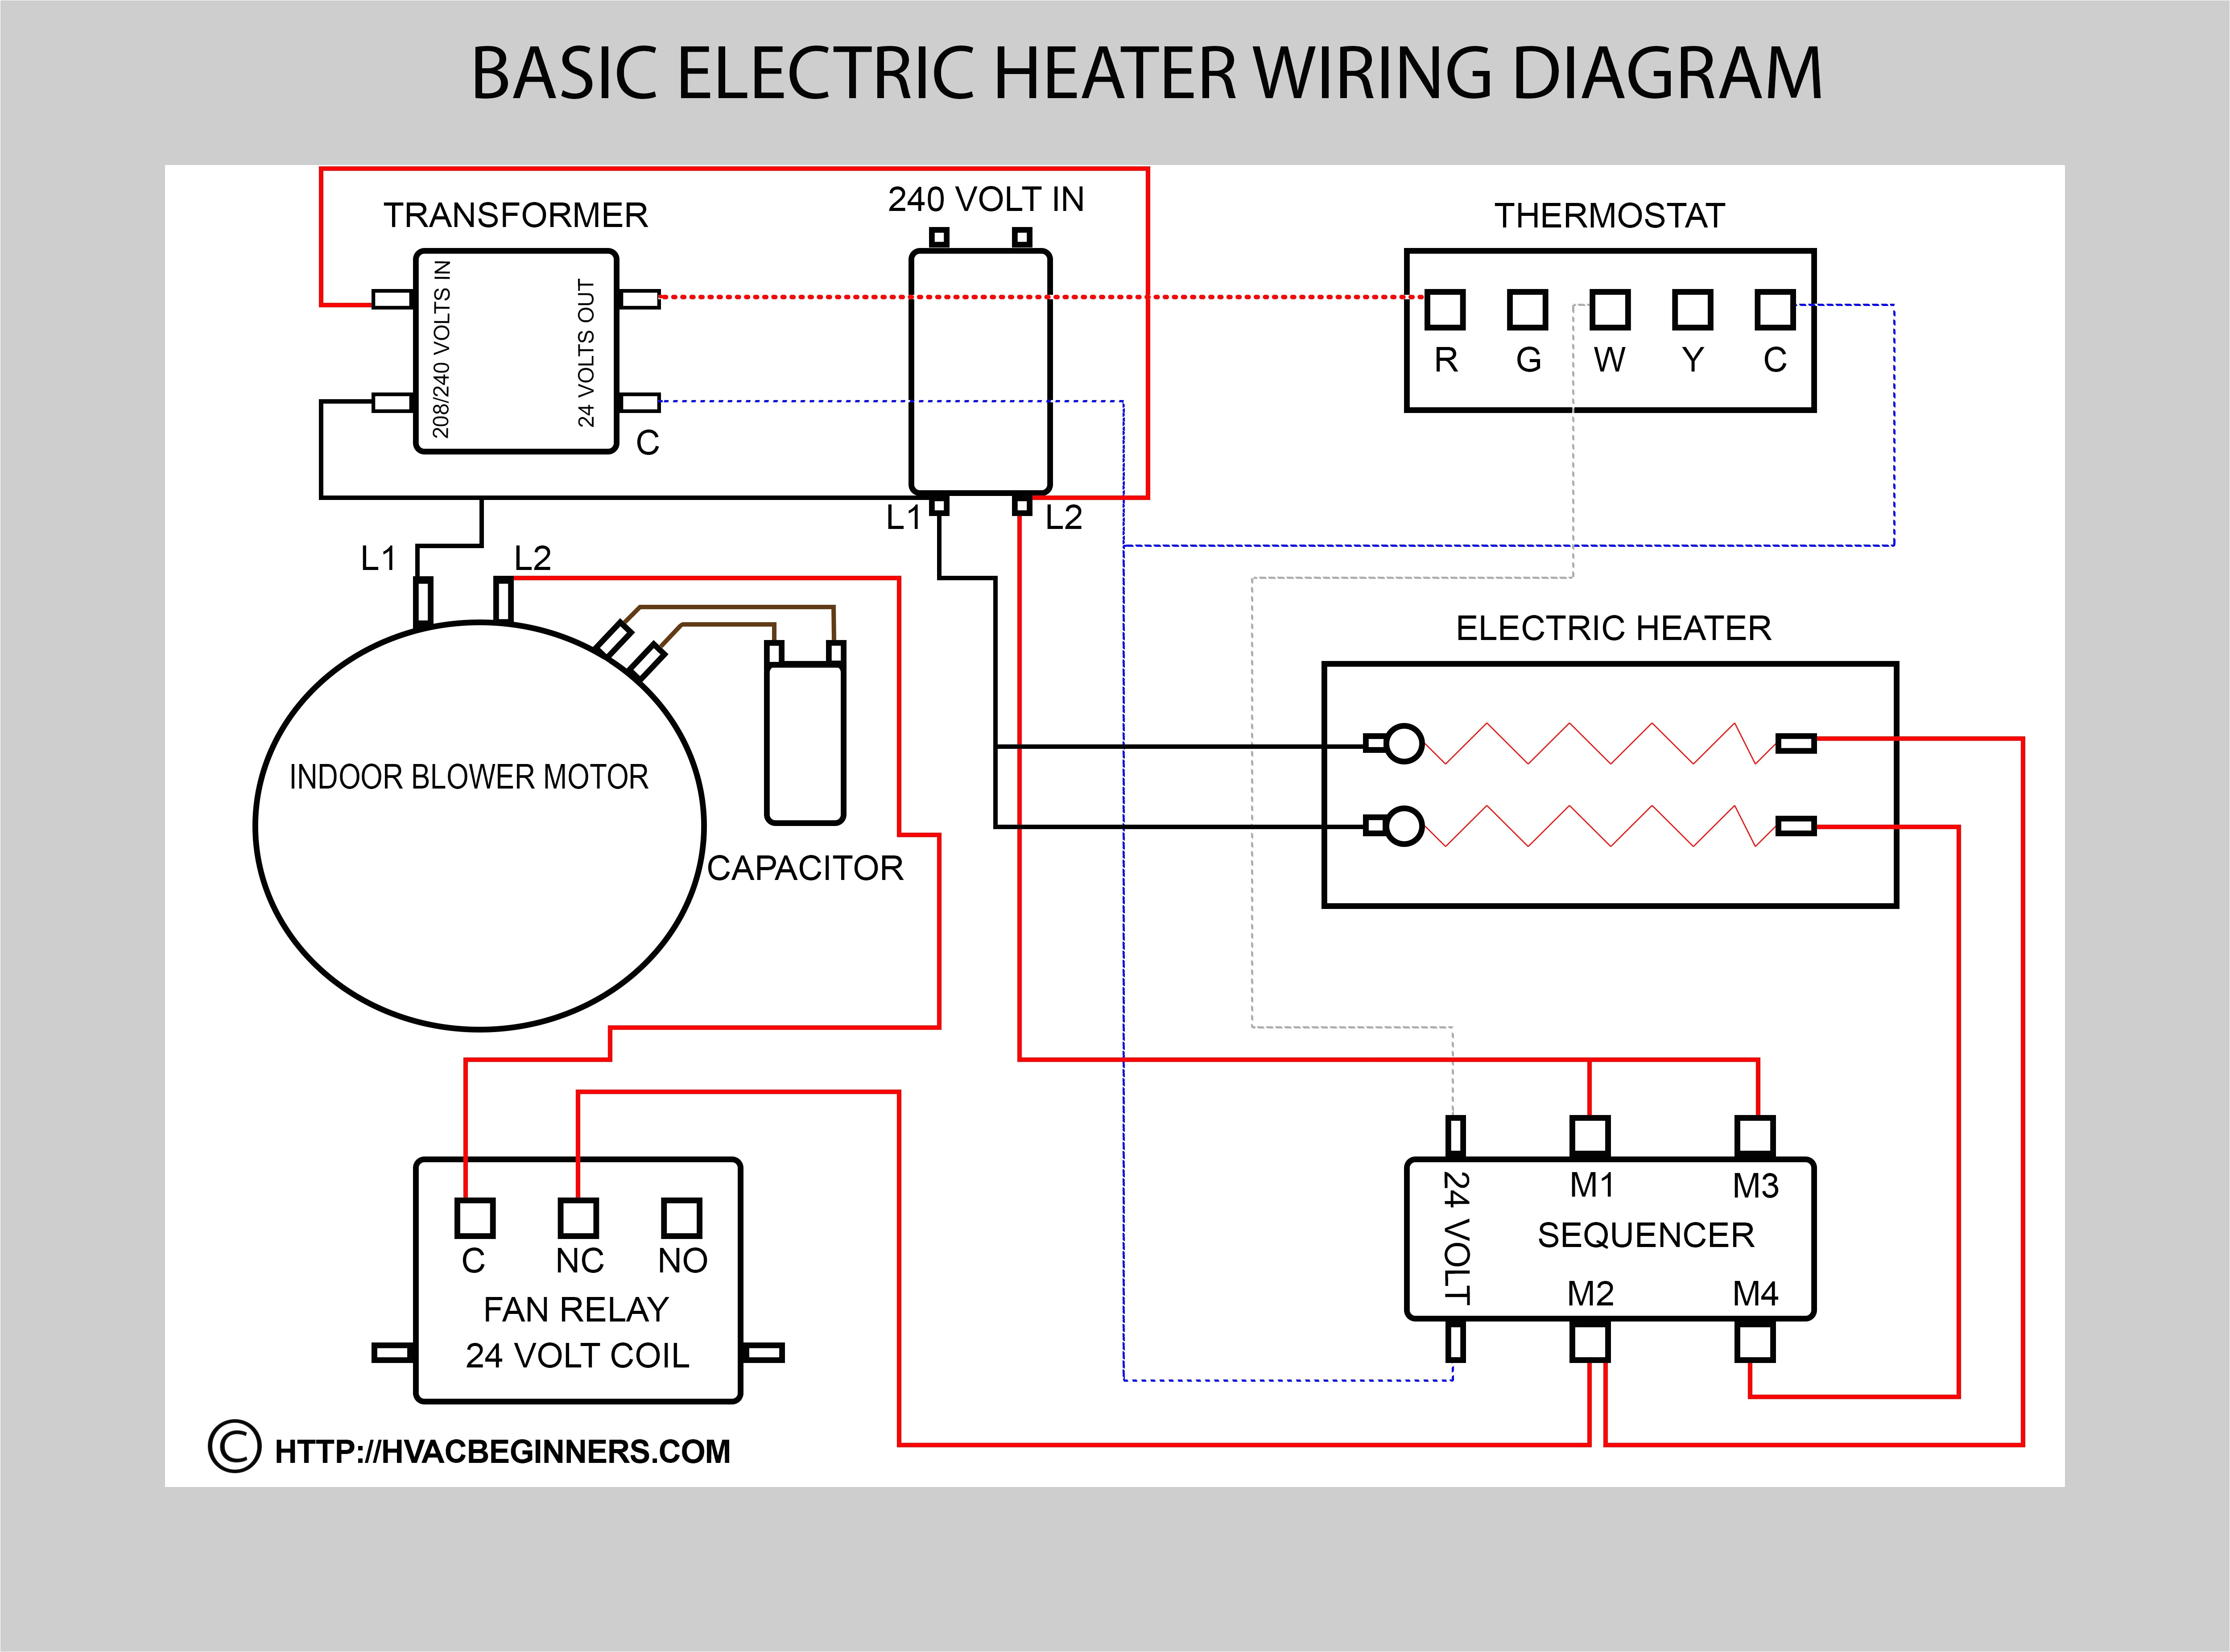 heater wiring diagram just wiring data rh ag skiphire co uk goodman gas furnace thermostat wiring